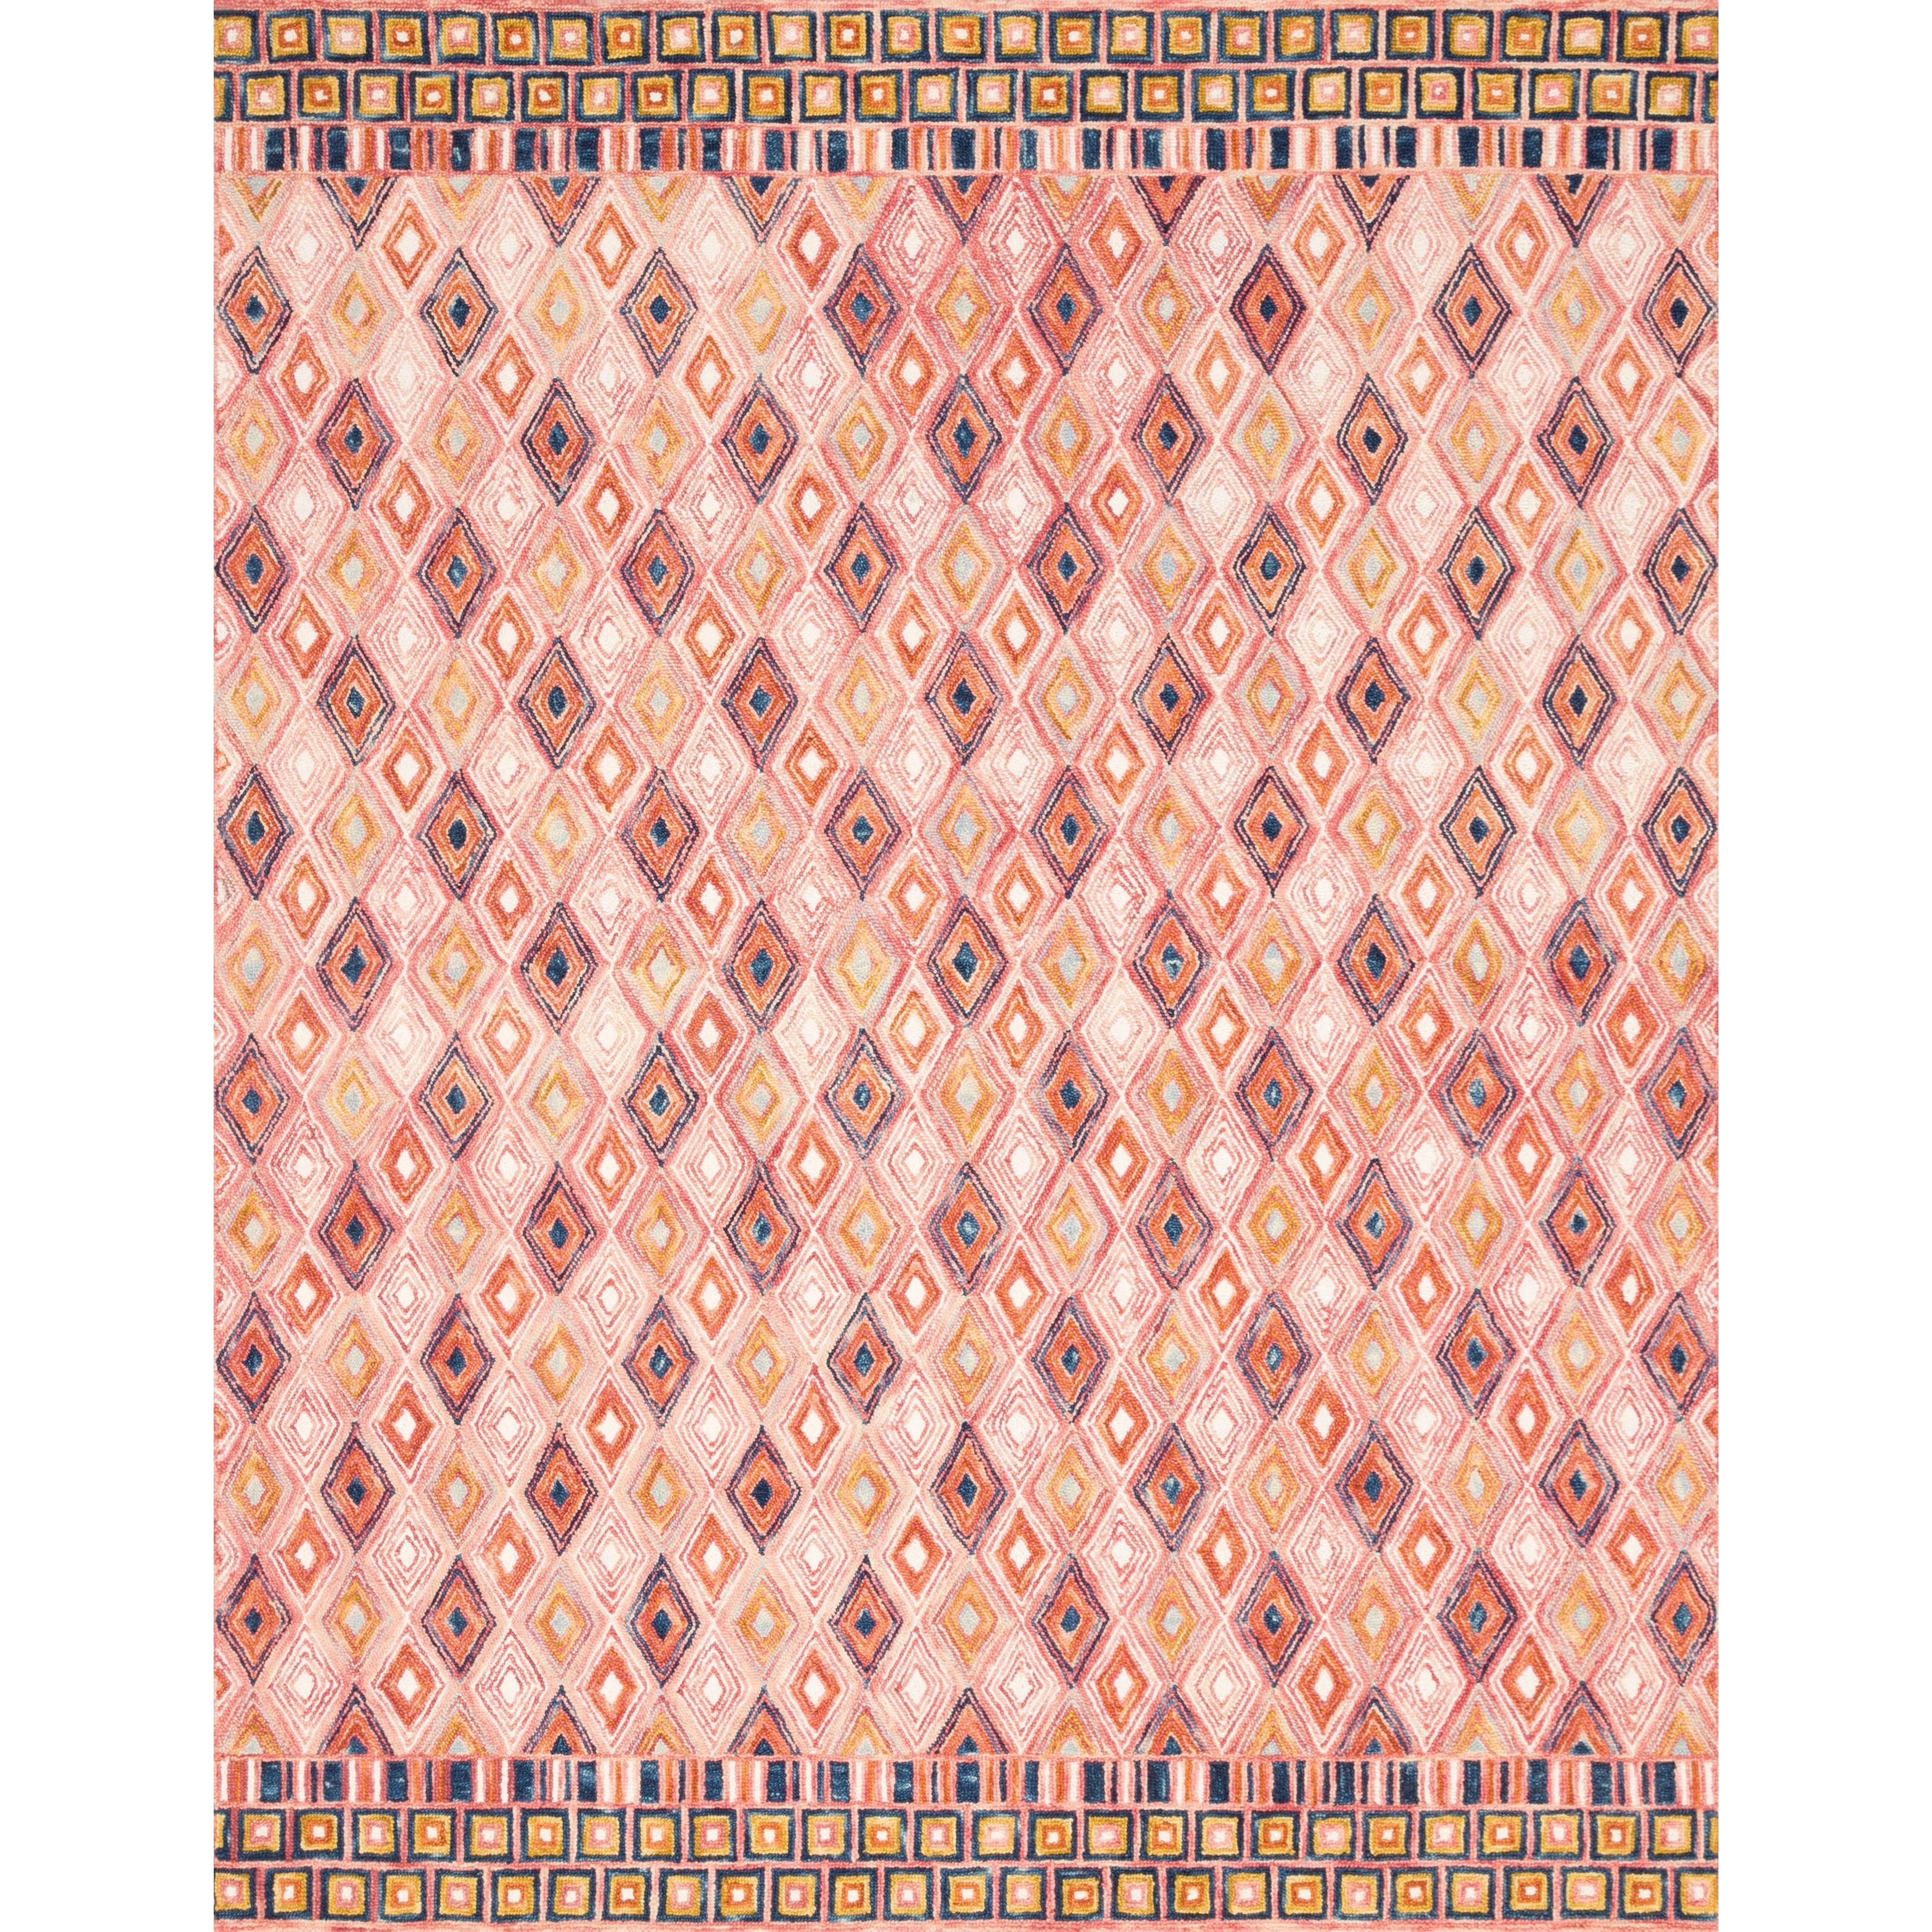 "Priti 2'6"" x 9'9"" Pink / Sunset Rug by Loloi Rugs at Virginia Furniture Market"